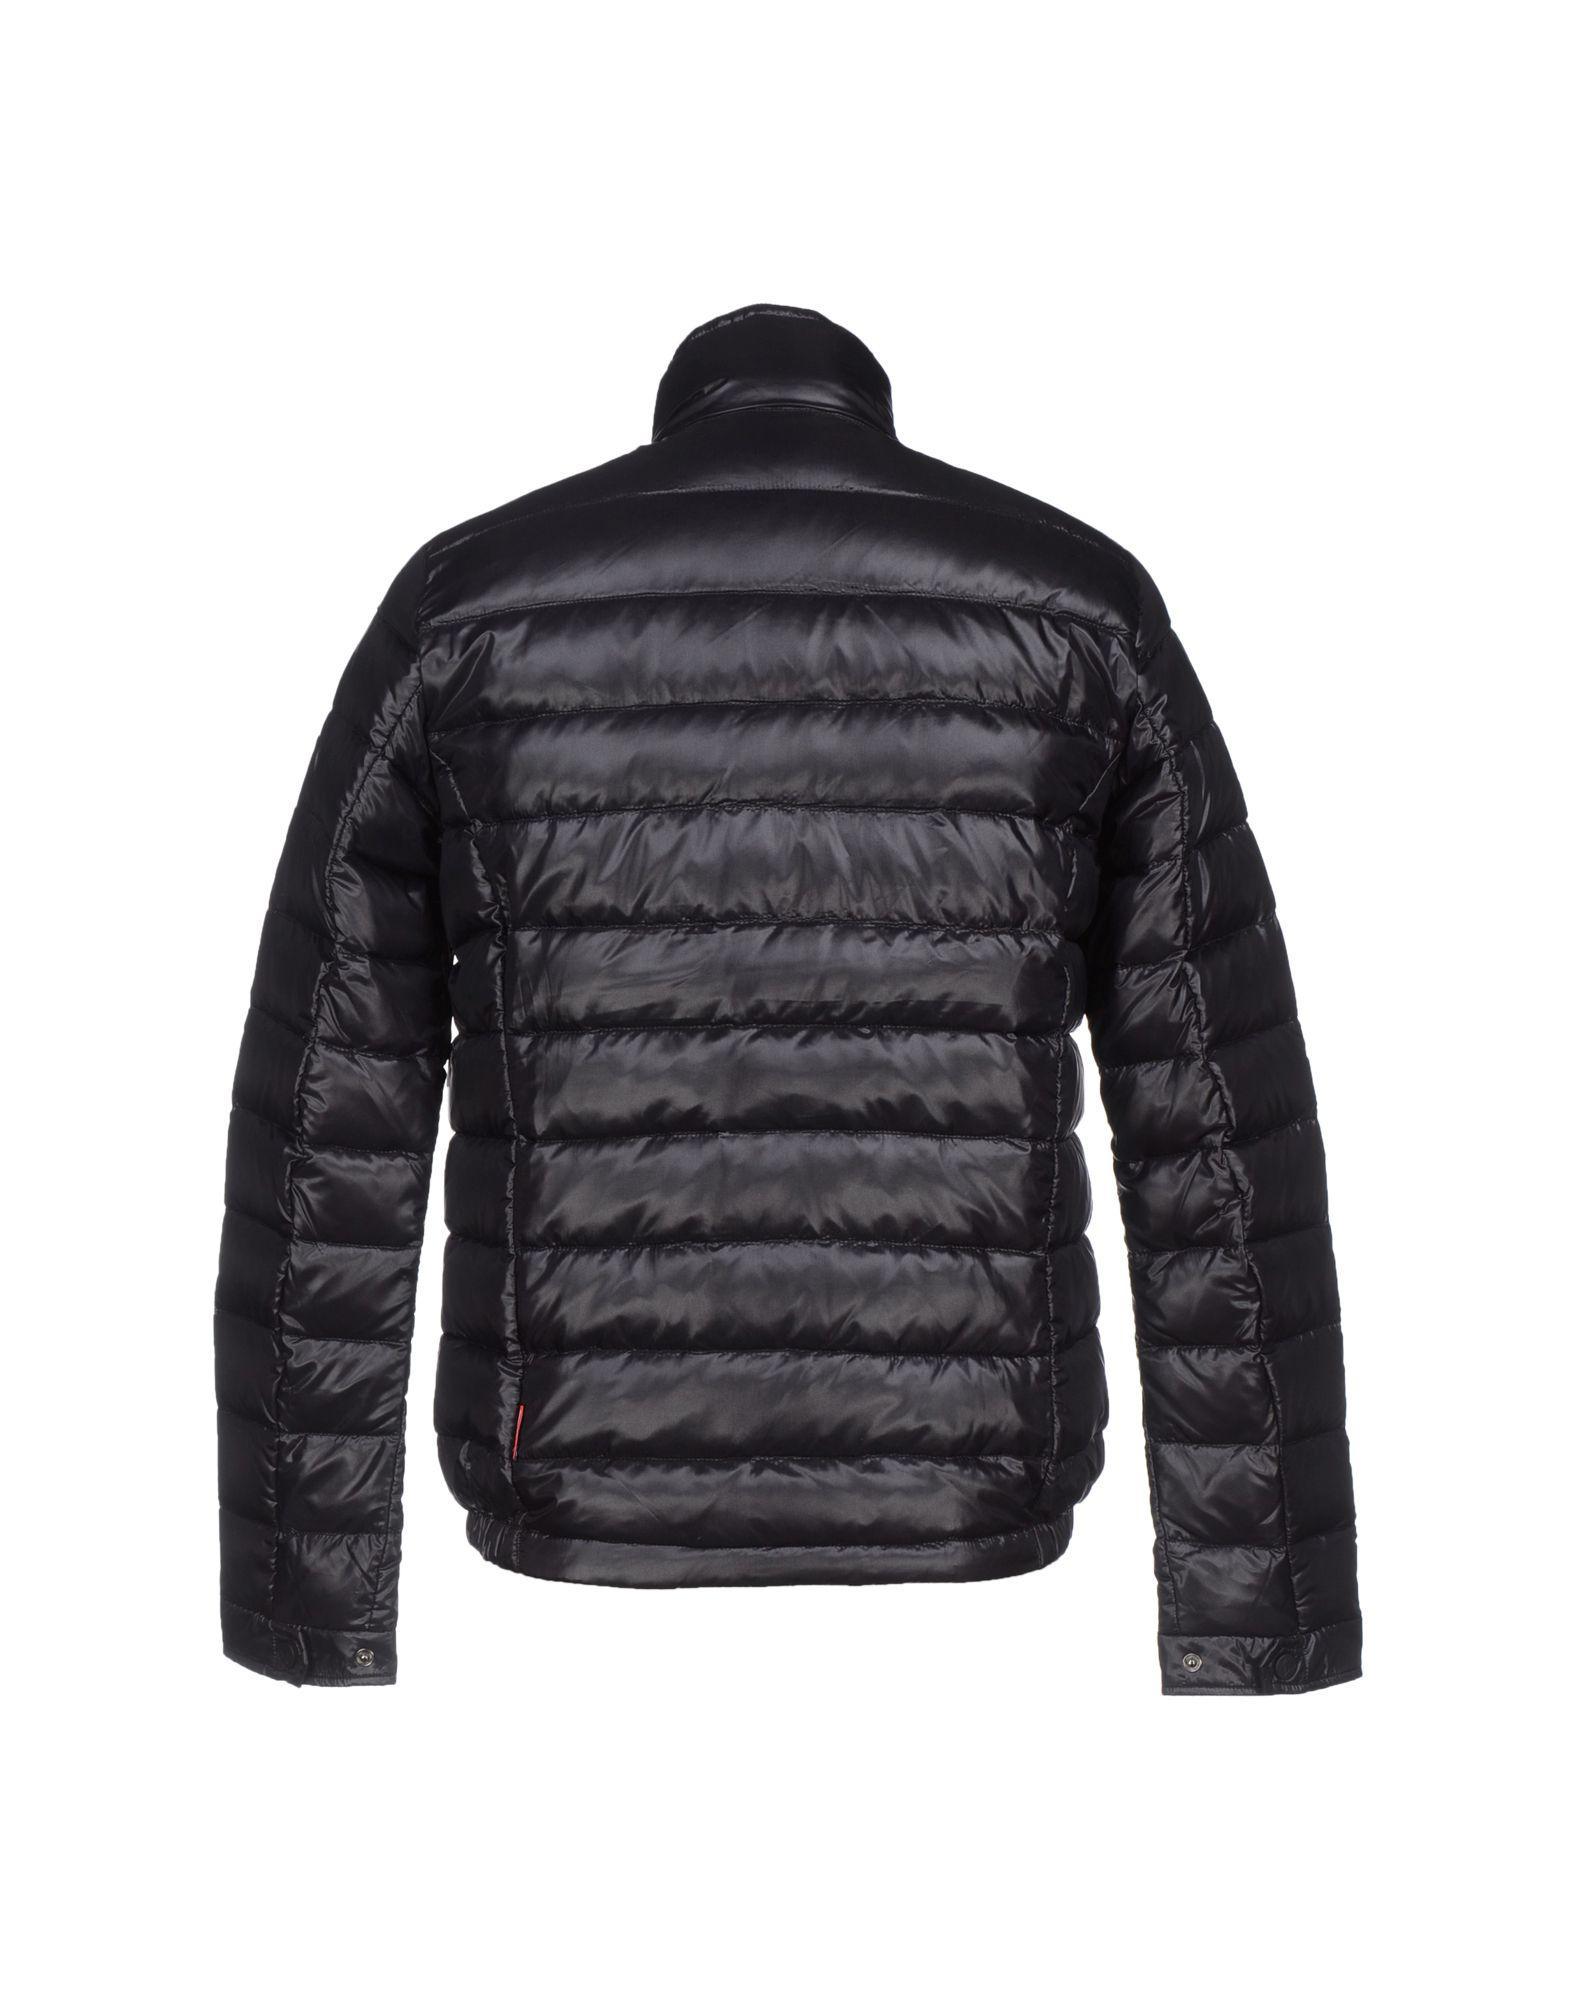 Rossignol Down Jacket in Black for Men